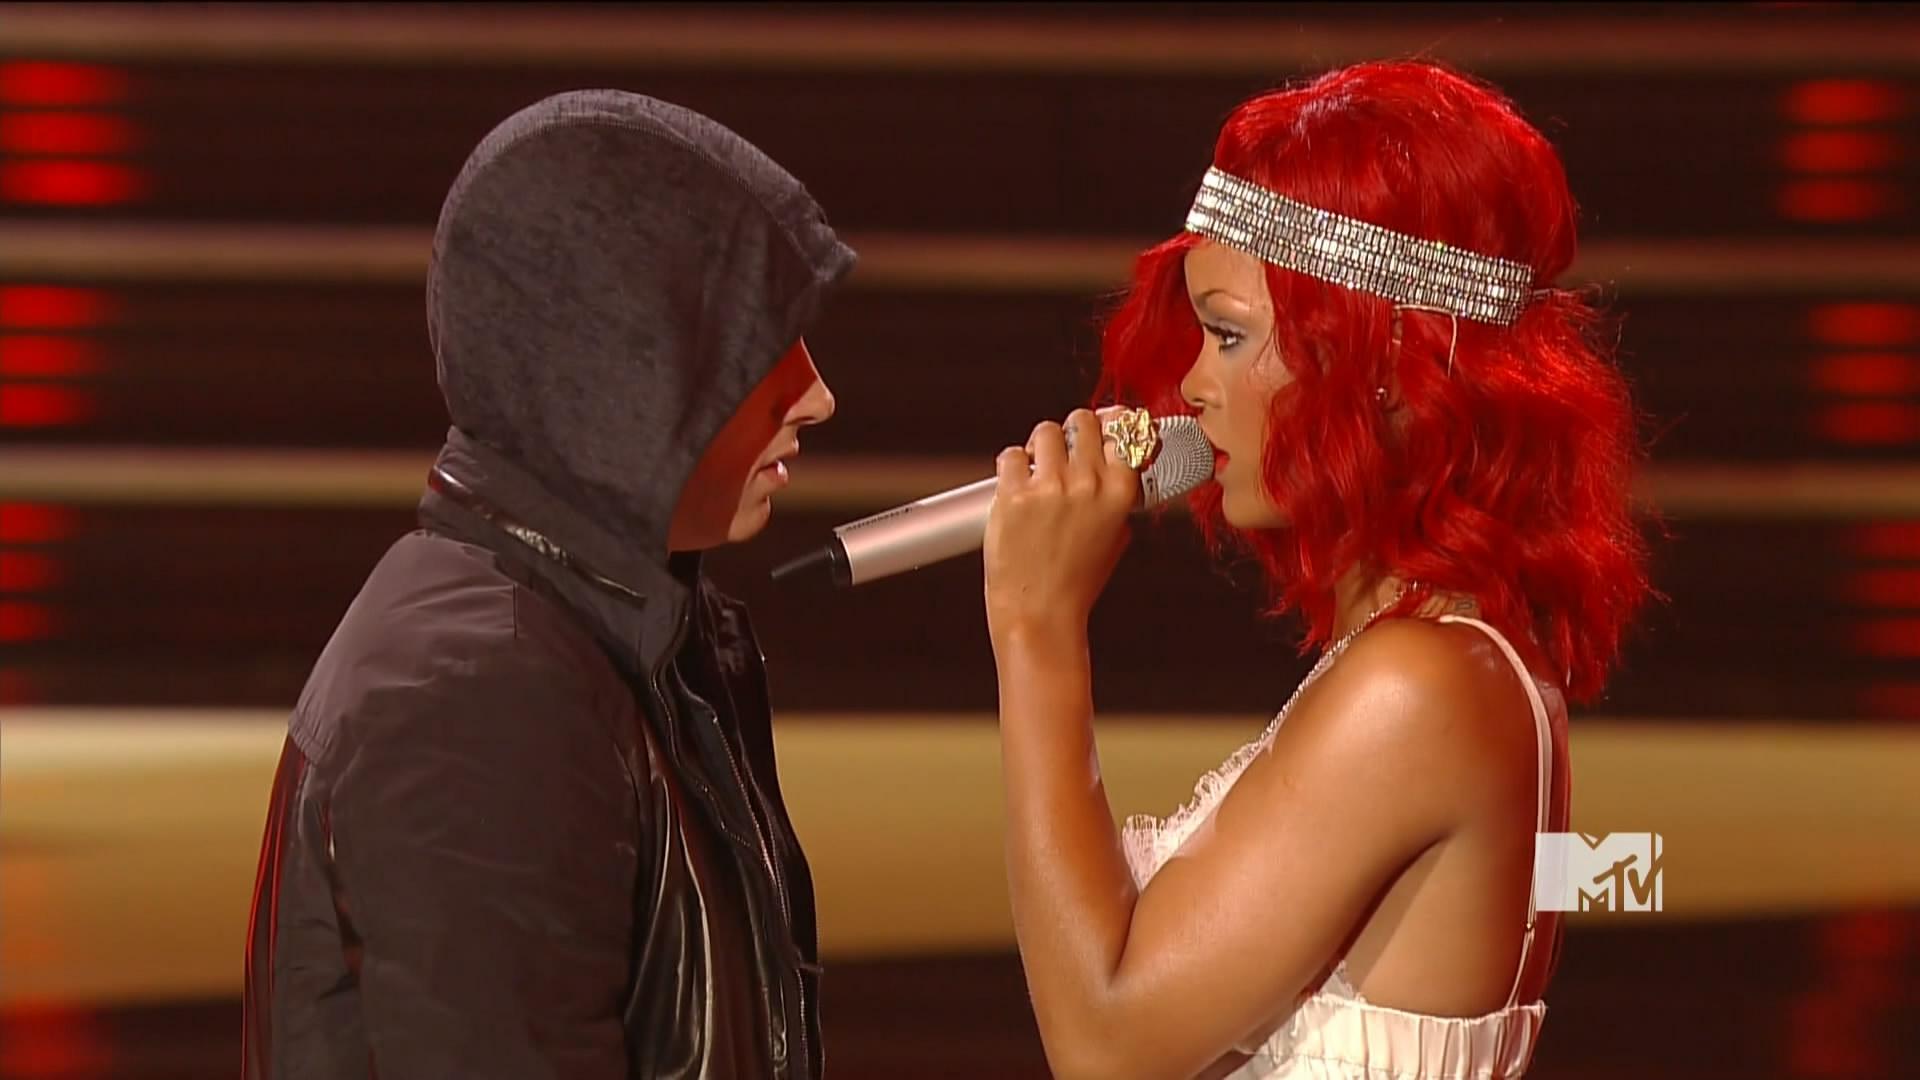 ¿Cuánto mide Eminem? - Altura - Real height Eminem%20-%20Not%20Afraid%20&%20Love%20the%20Way%20You%20Lie%20ft_%20Rihanna%20Live%20MTV%20Video%20Music%20Awards%202010%20HD